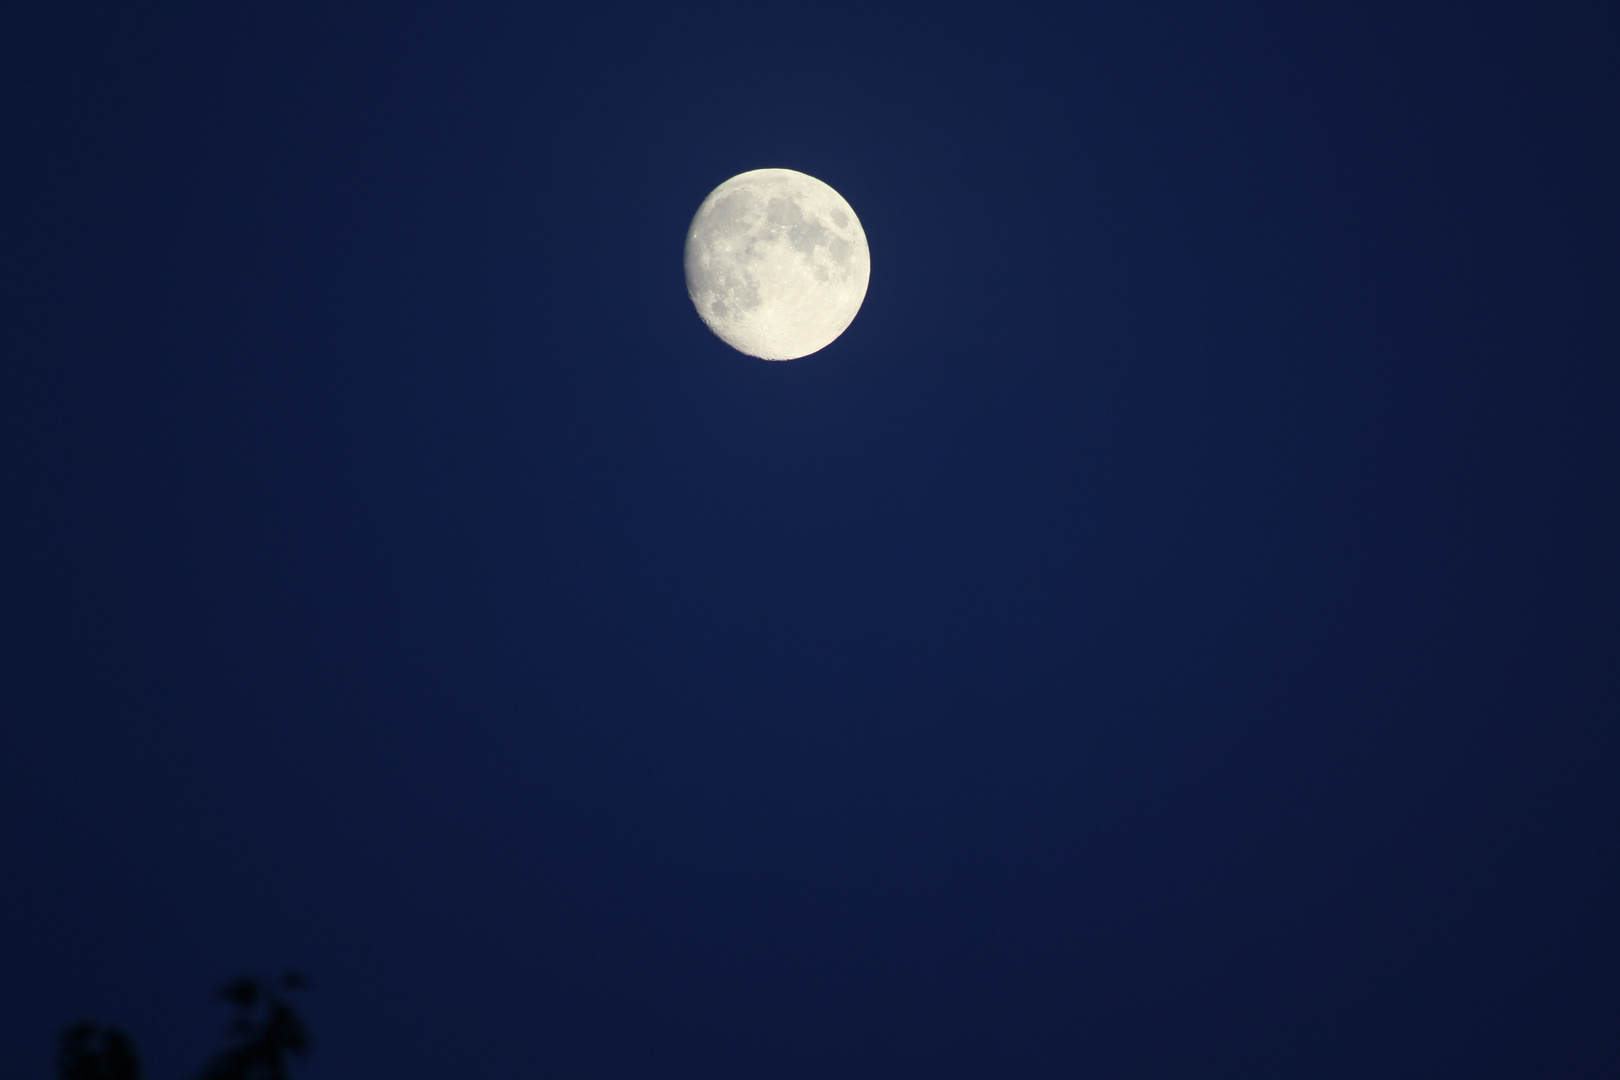 Walking on the moon...